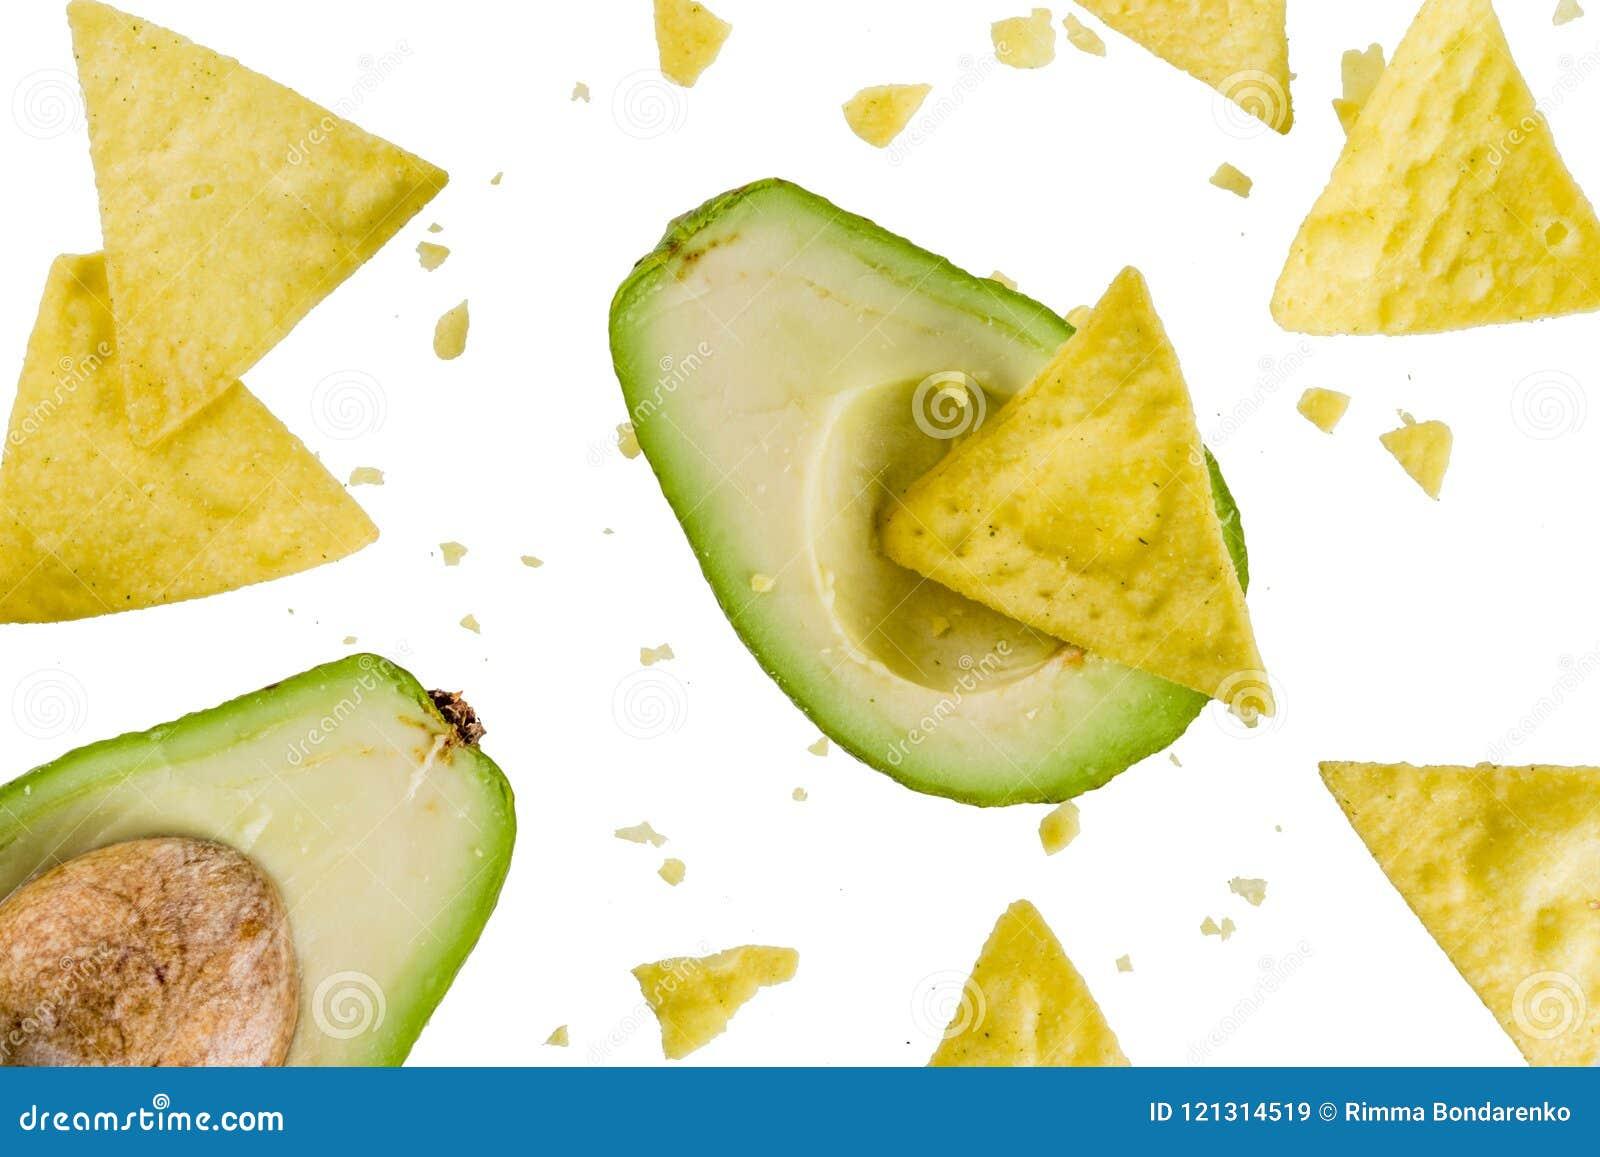 Mexican food concept, guacamole and nachos snack, avocado and to